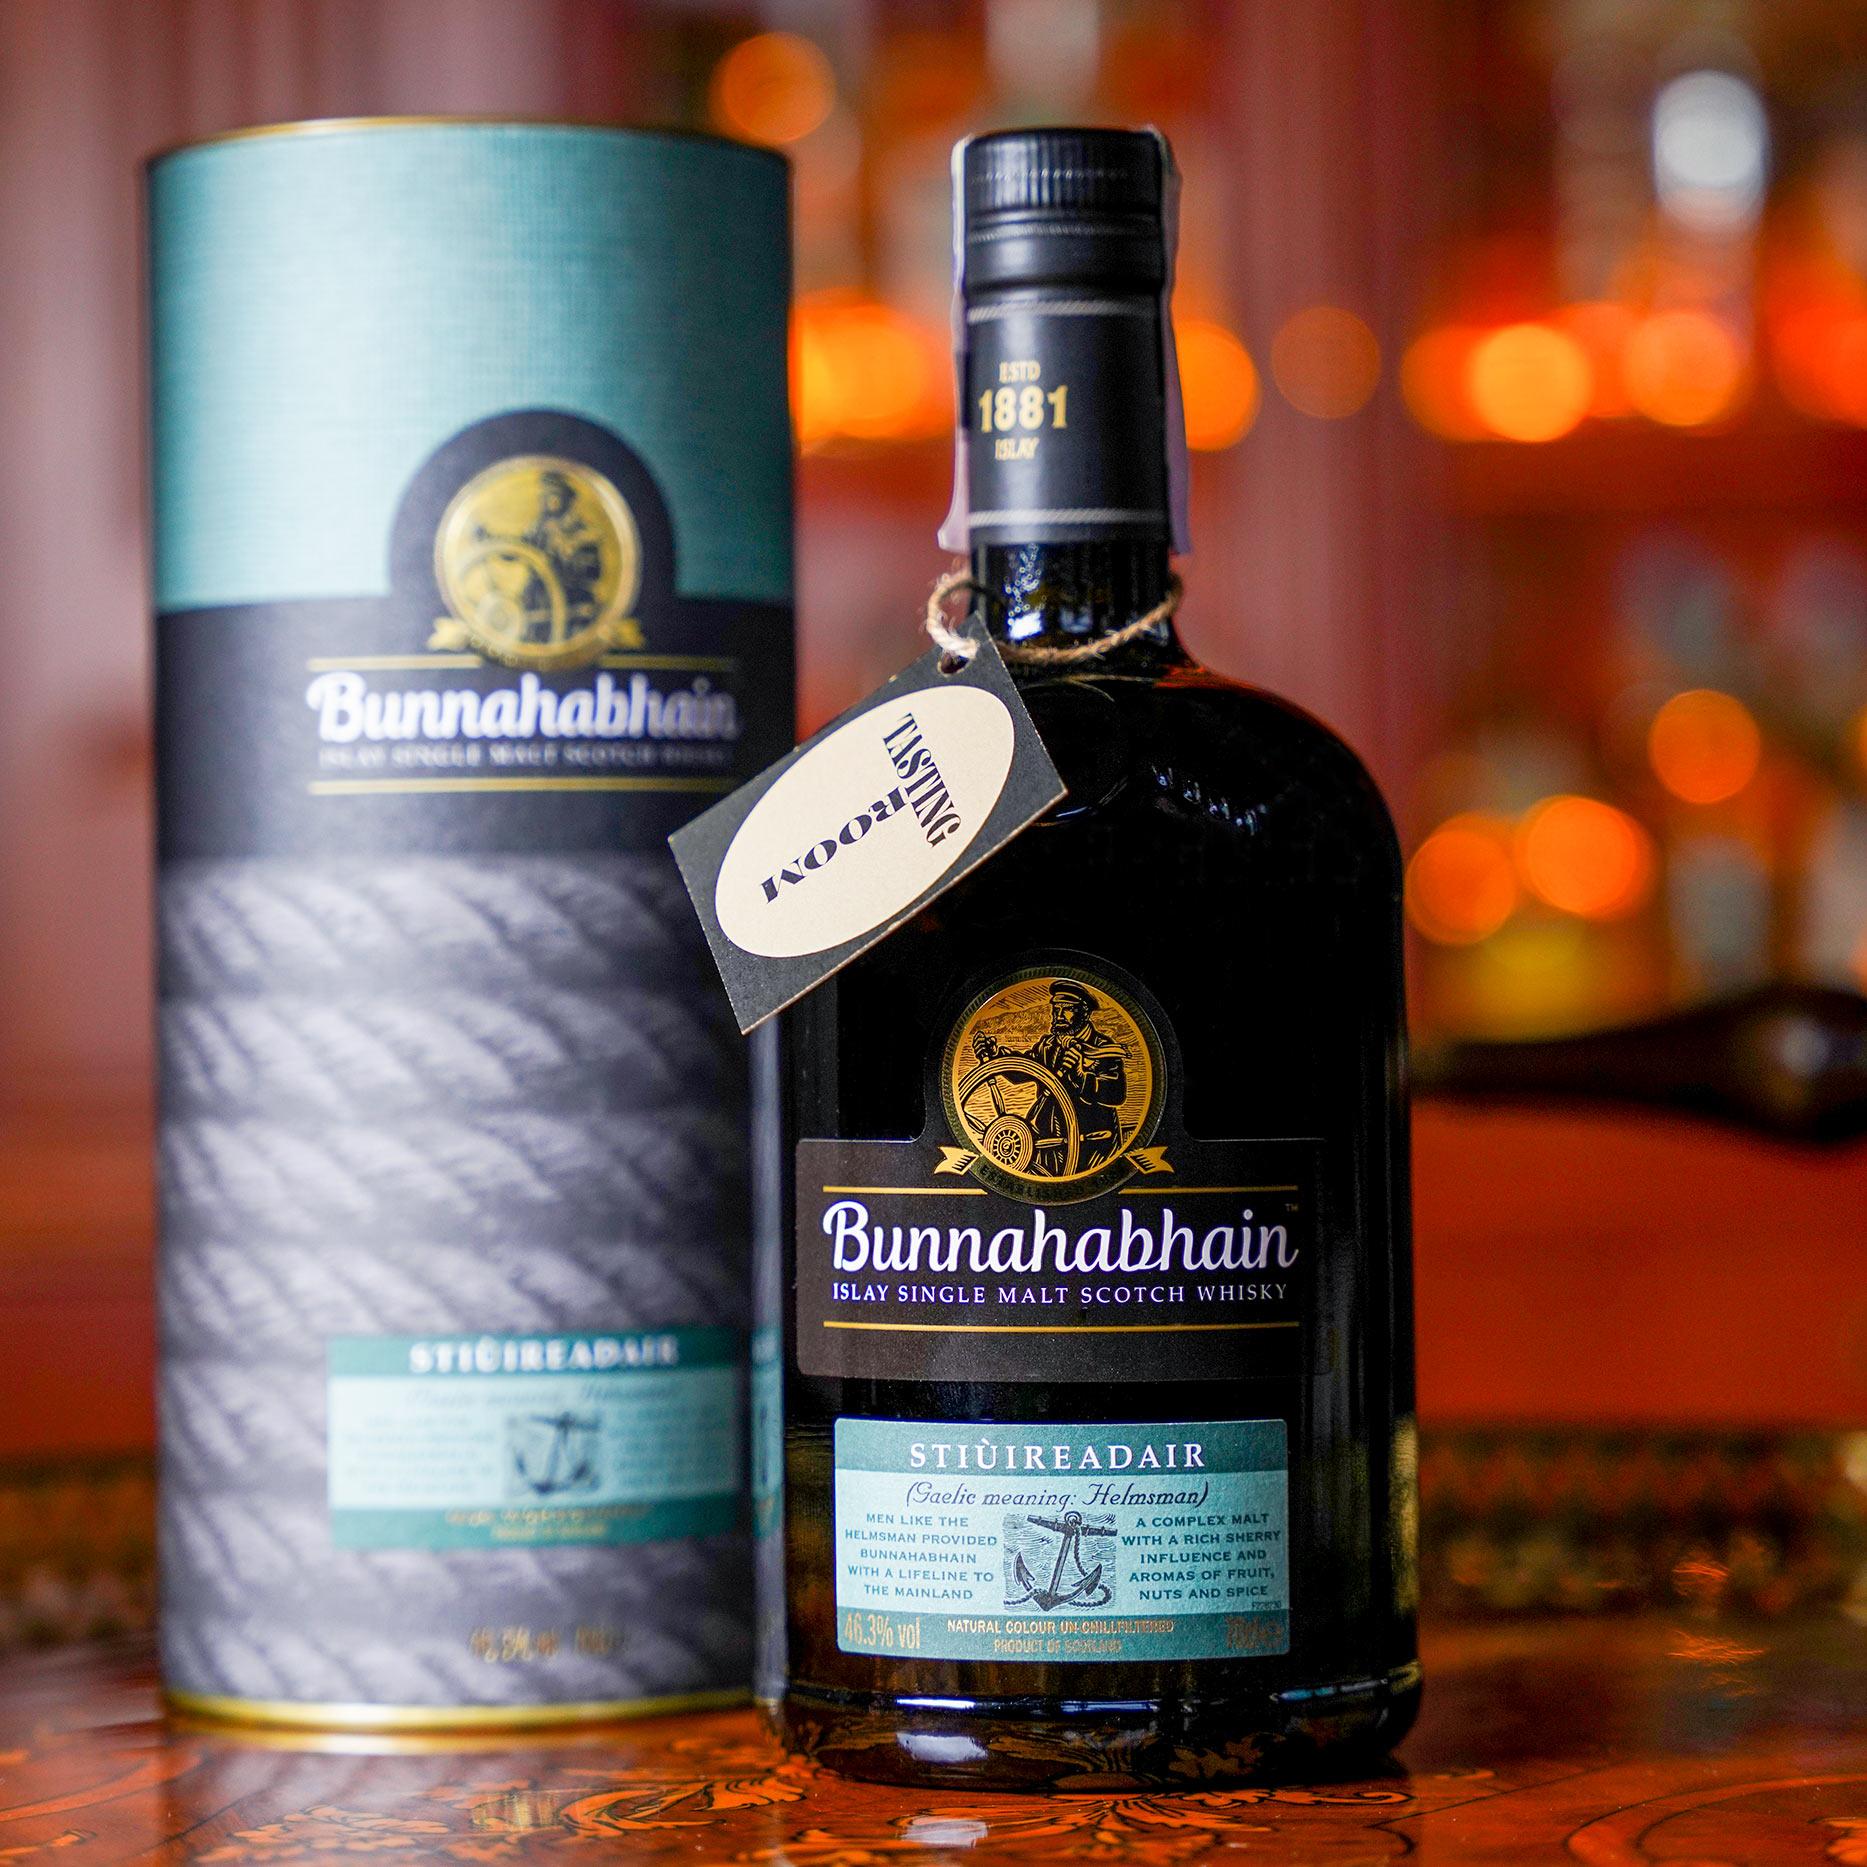 Bunnahabhain Stiuireadair / Бунахабън Стю-Радур или Кормчия